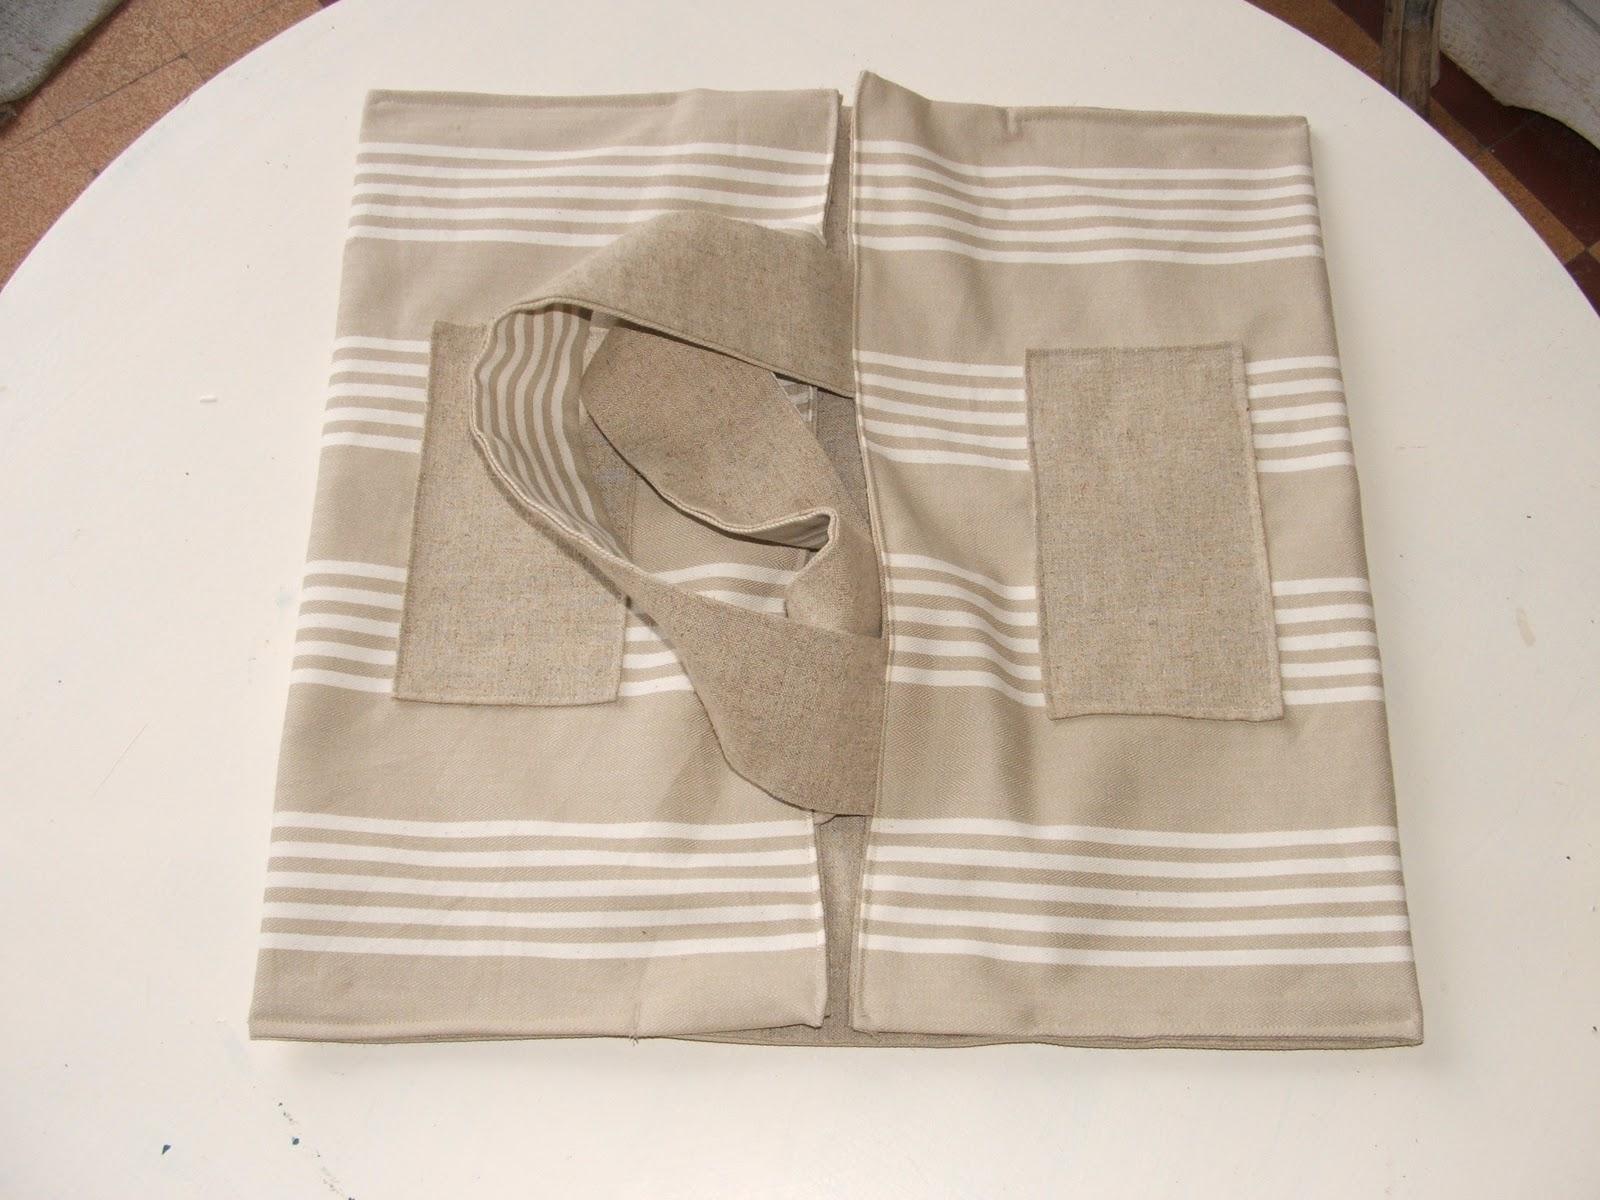 lin dispensable sac porte tarte. Black Bedroom Furniture Sets. Home Design Ideas